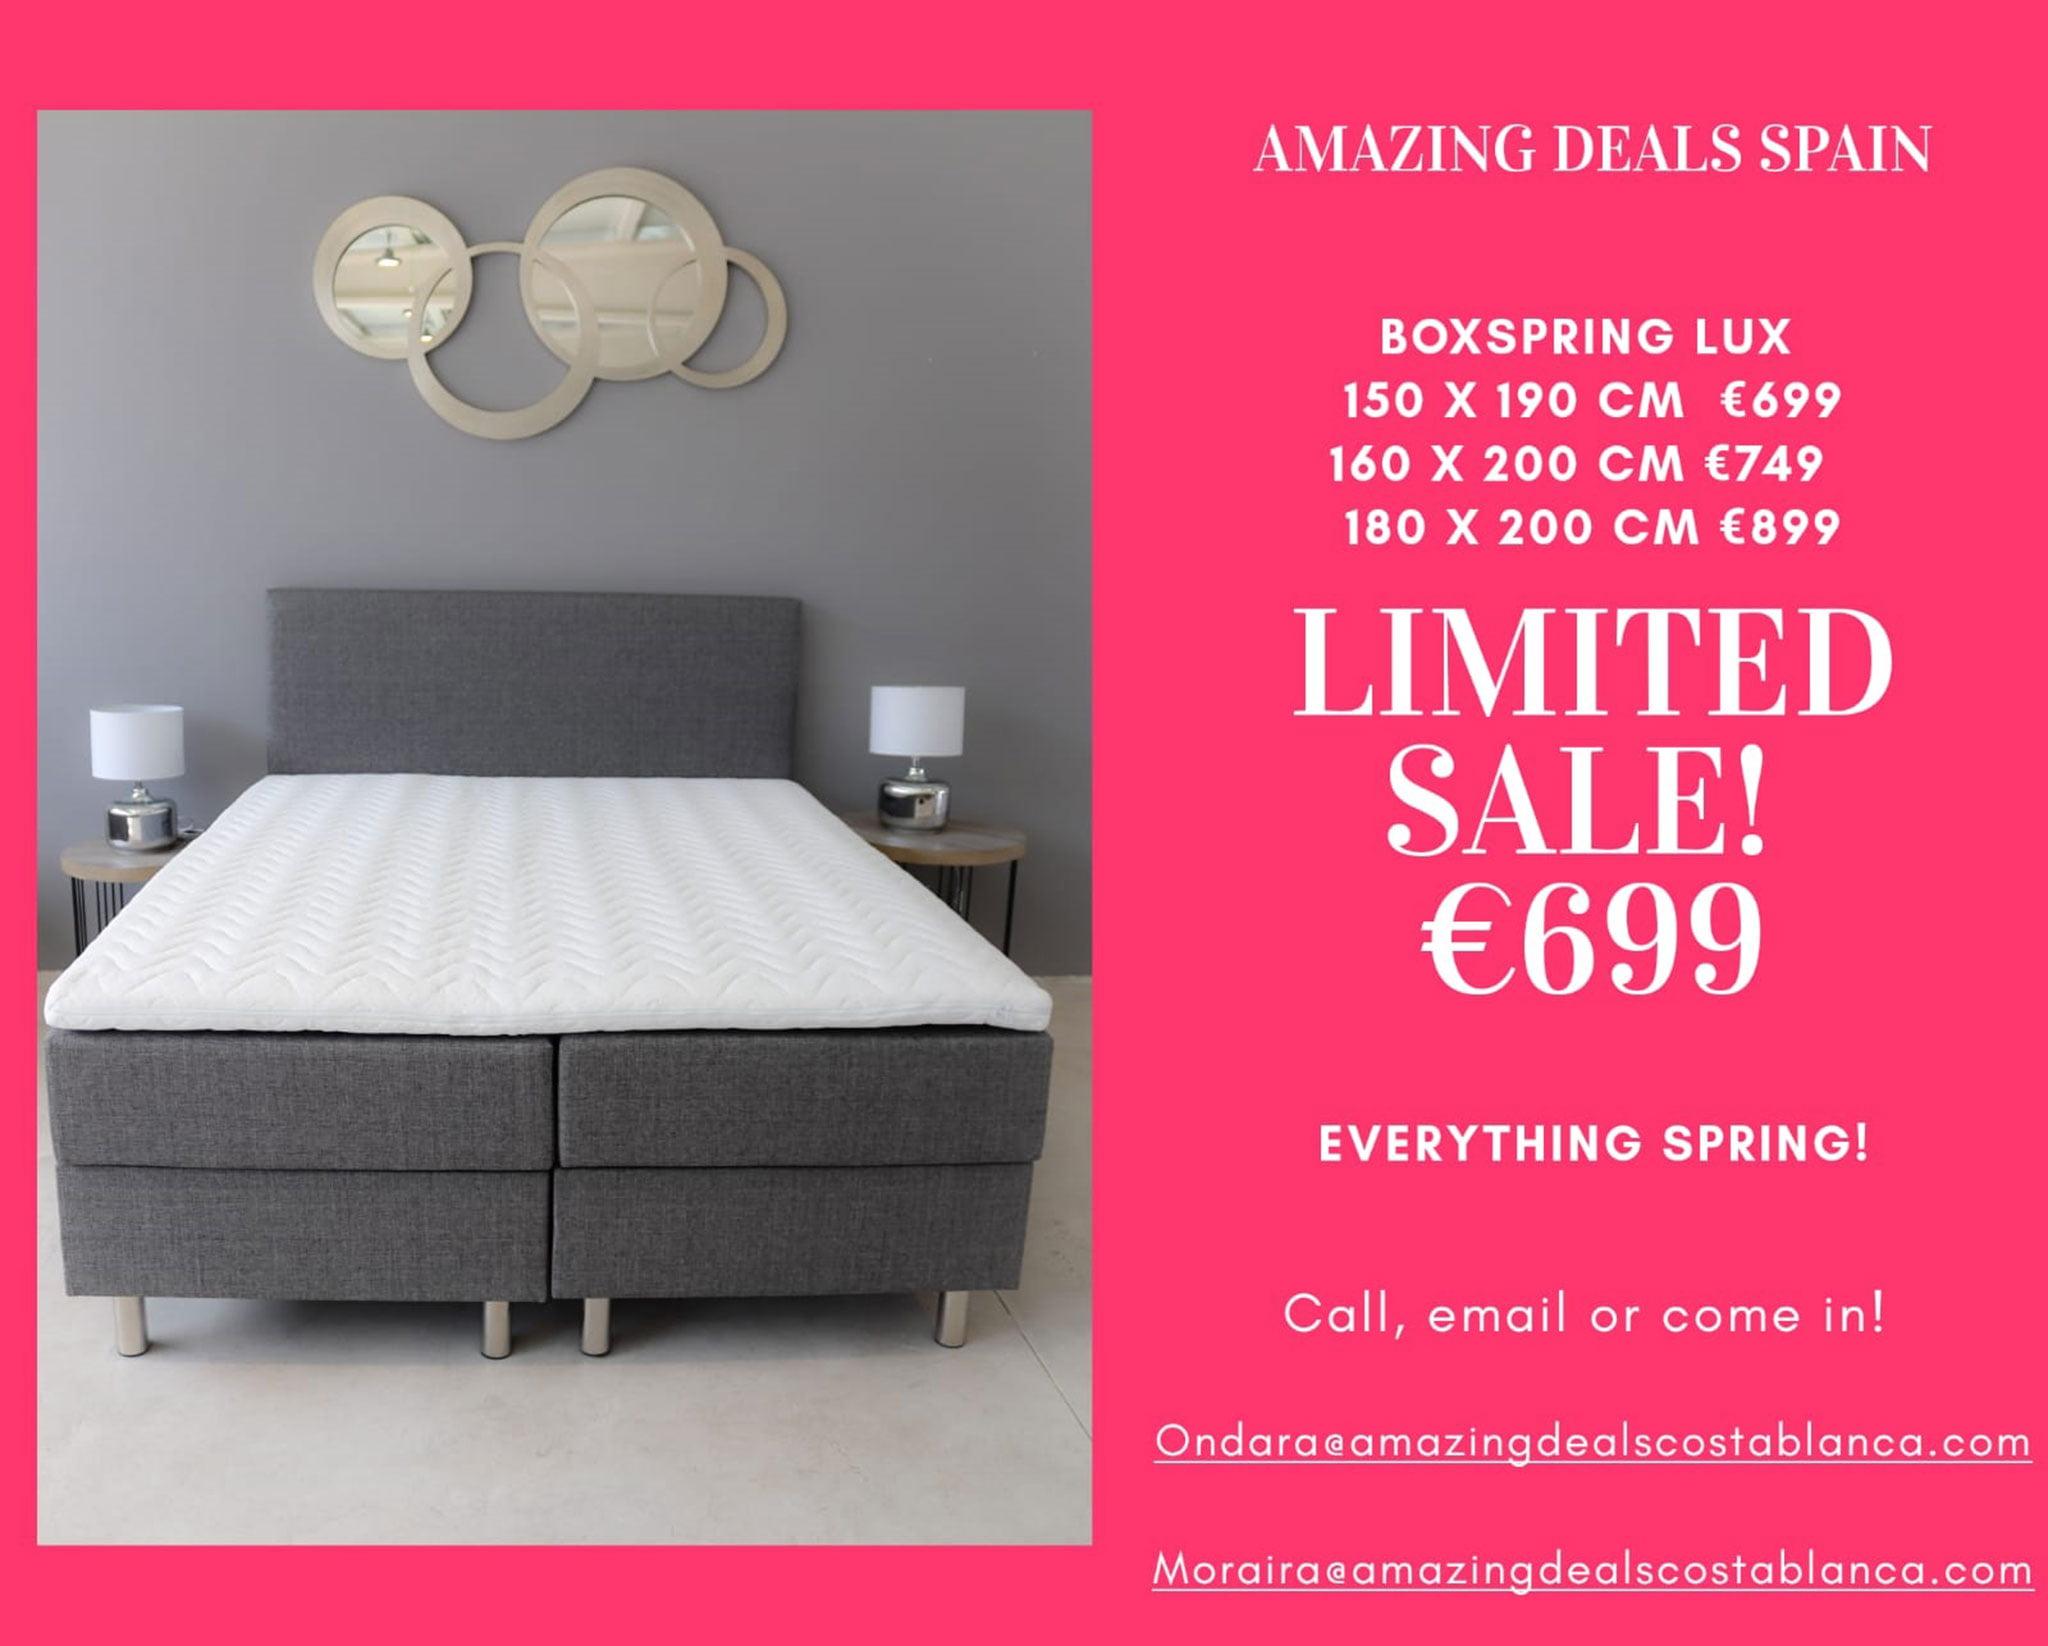 Oferta de Amazing Deals Costa Blanca